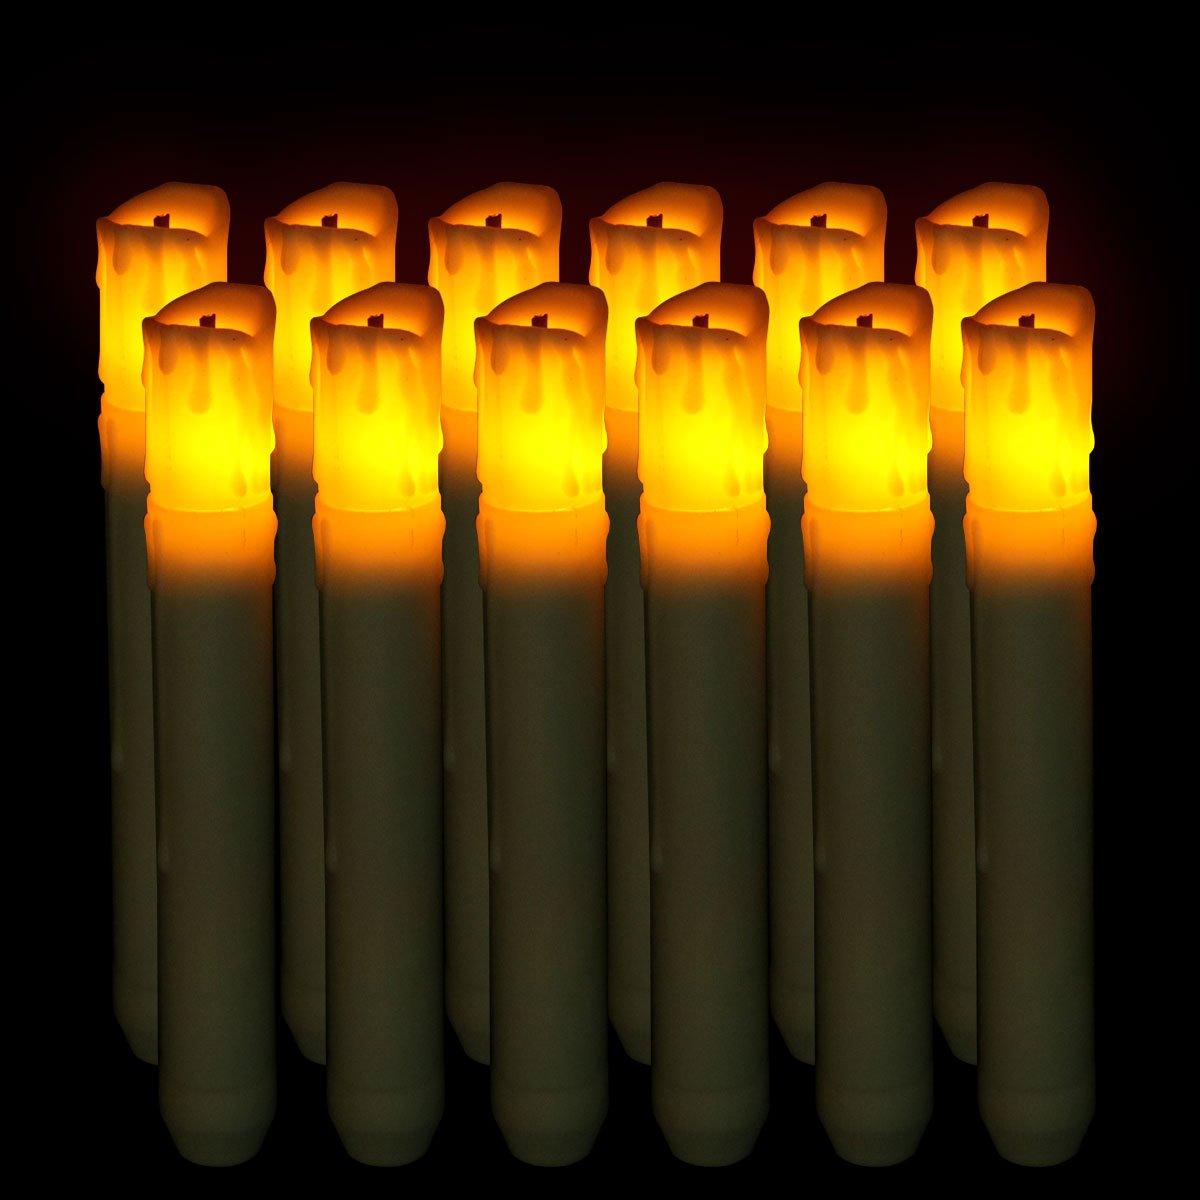 micandle 12セットイエローミニ電池式AmberちらつきLEDテーパキャンドル、イエローFlamelessバッテリLEDキャンドルスティック – 電池含まない イエロー c_taper_long_wick B0145YL1I6 14567 12pcs Yellow Long Wick 12pcs Yellow Long Wick